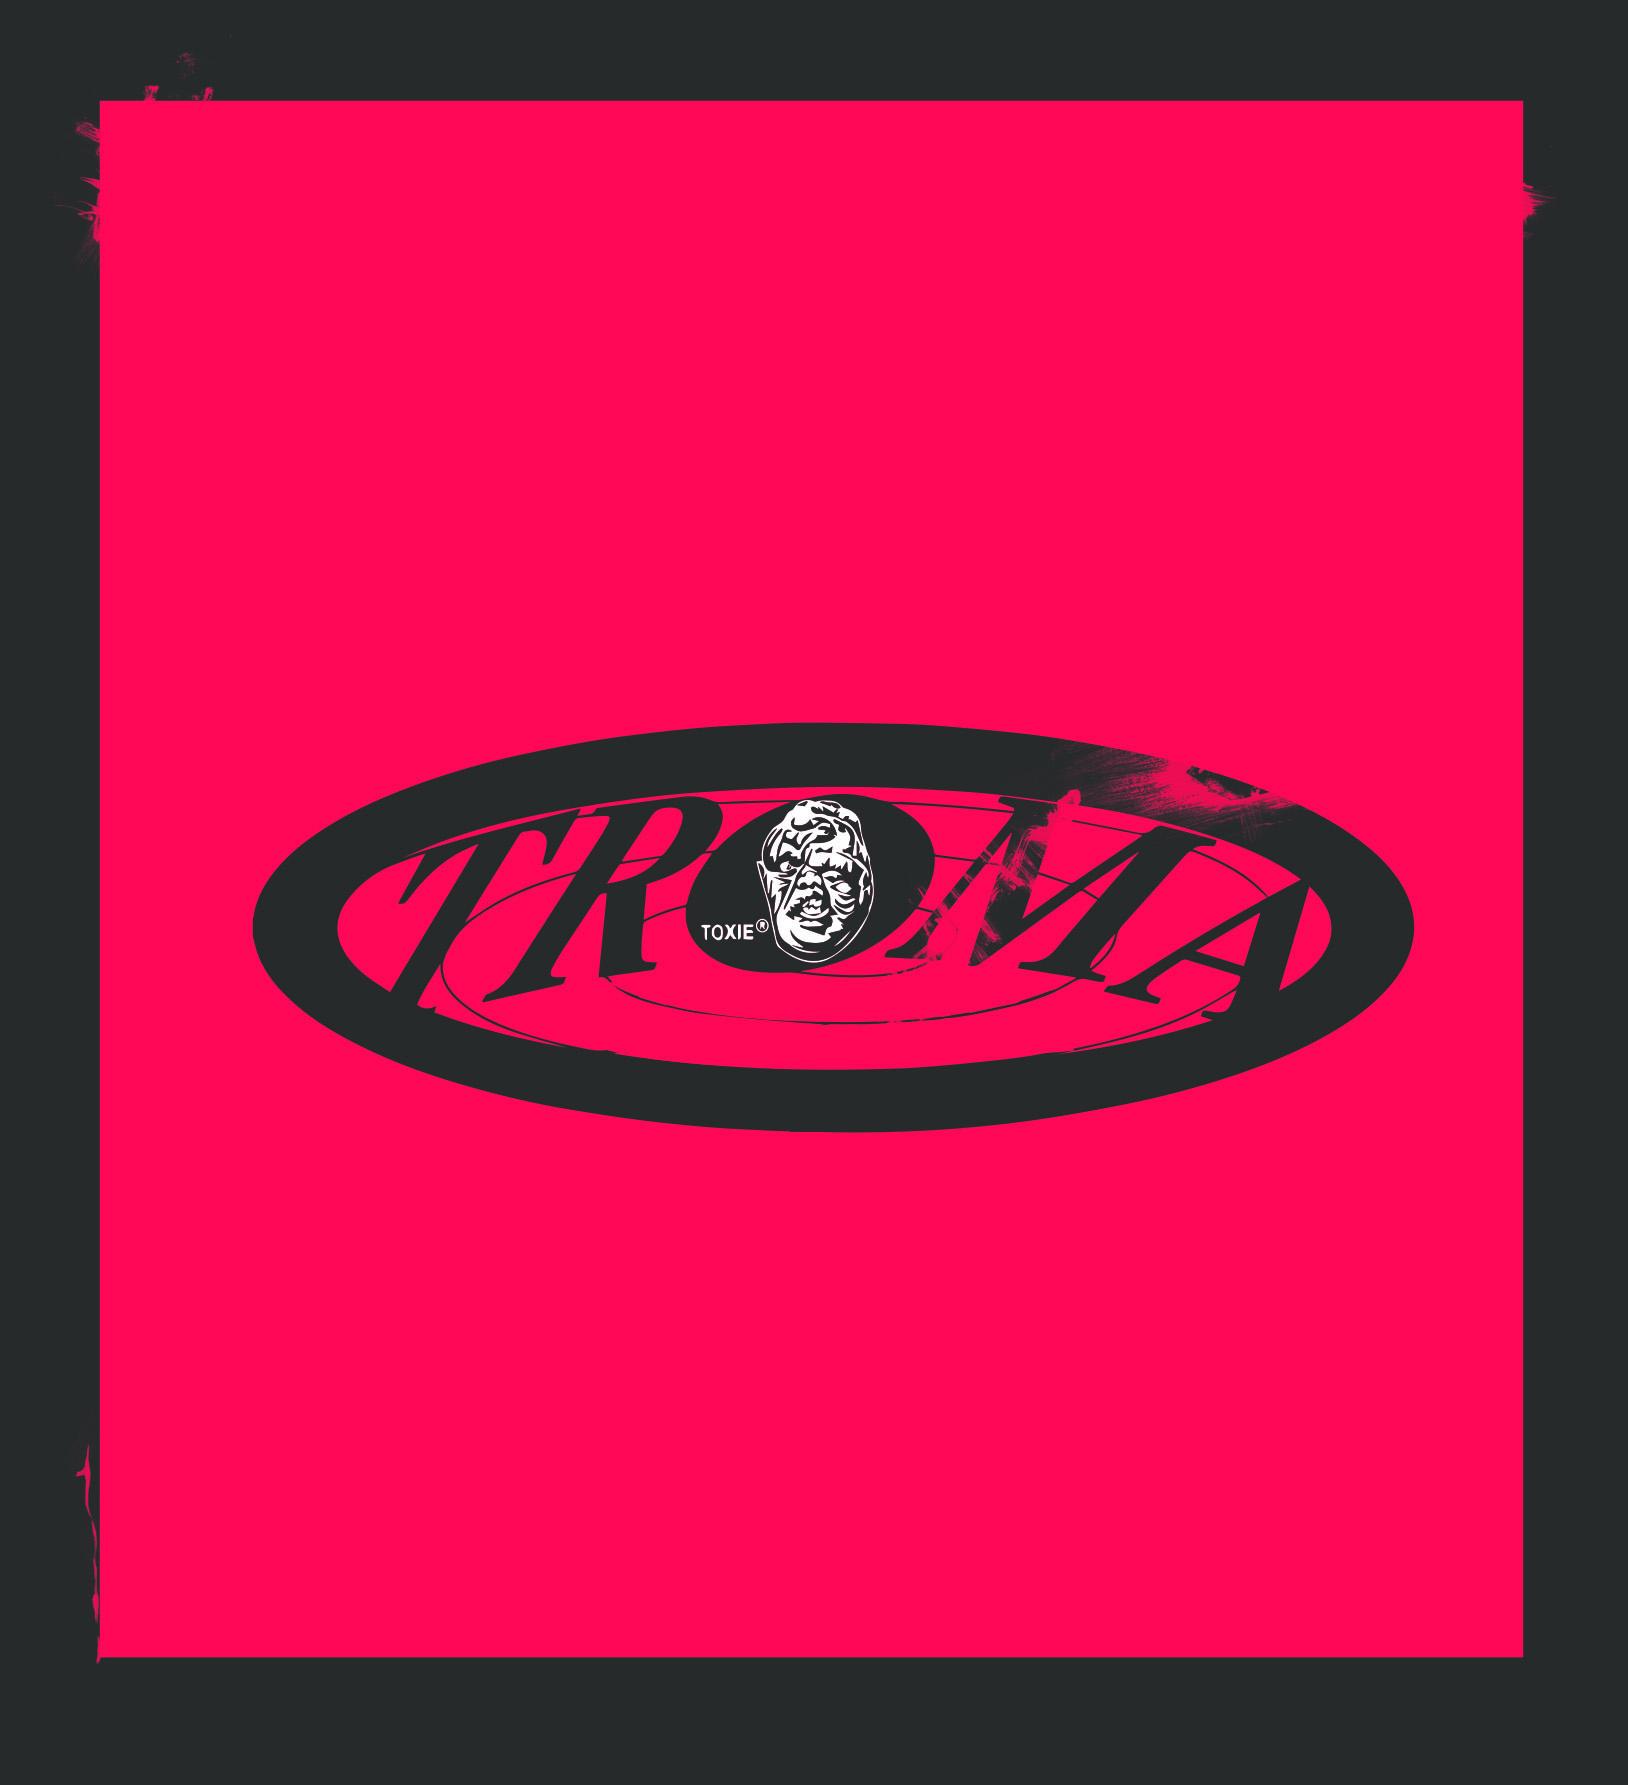 logo troma.jpg